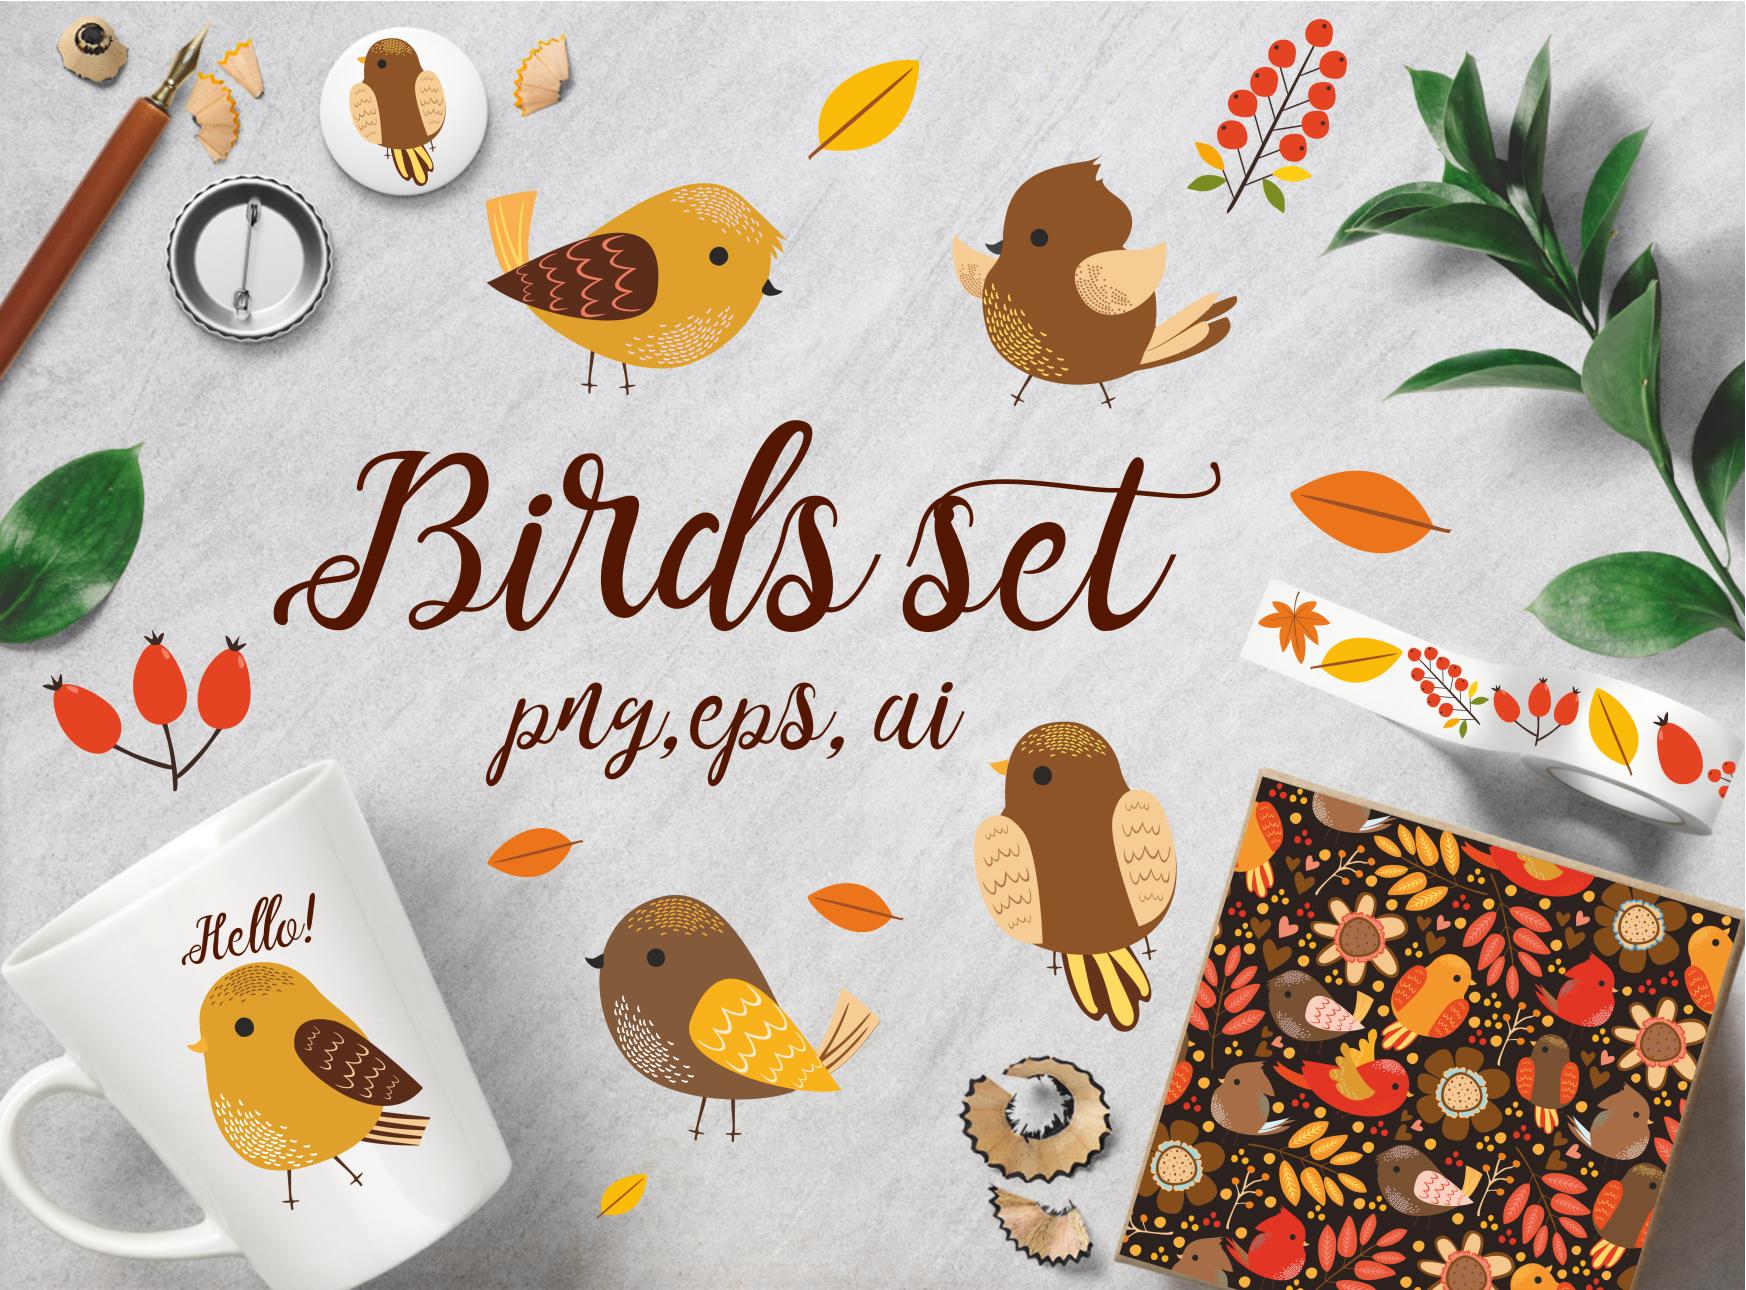 Birds set 2 (vector,jpg,png) example image 1